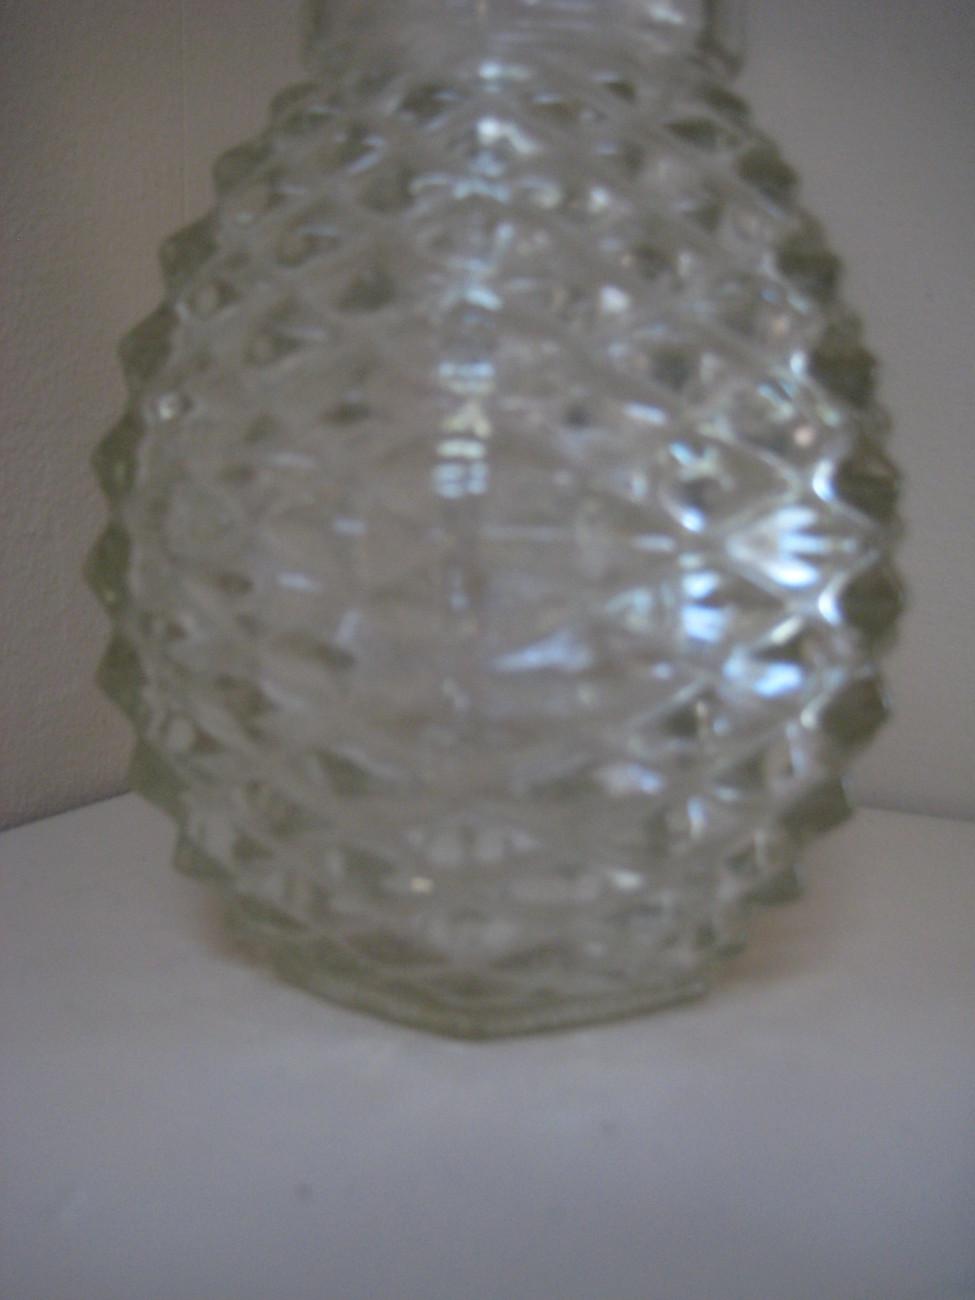 VINTAGE PRESSED DIAMOND POINT GLASS PINEAPPLE VASE - DATED 1980